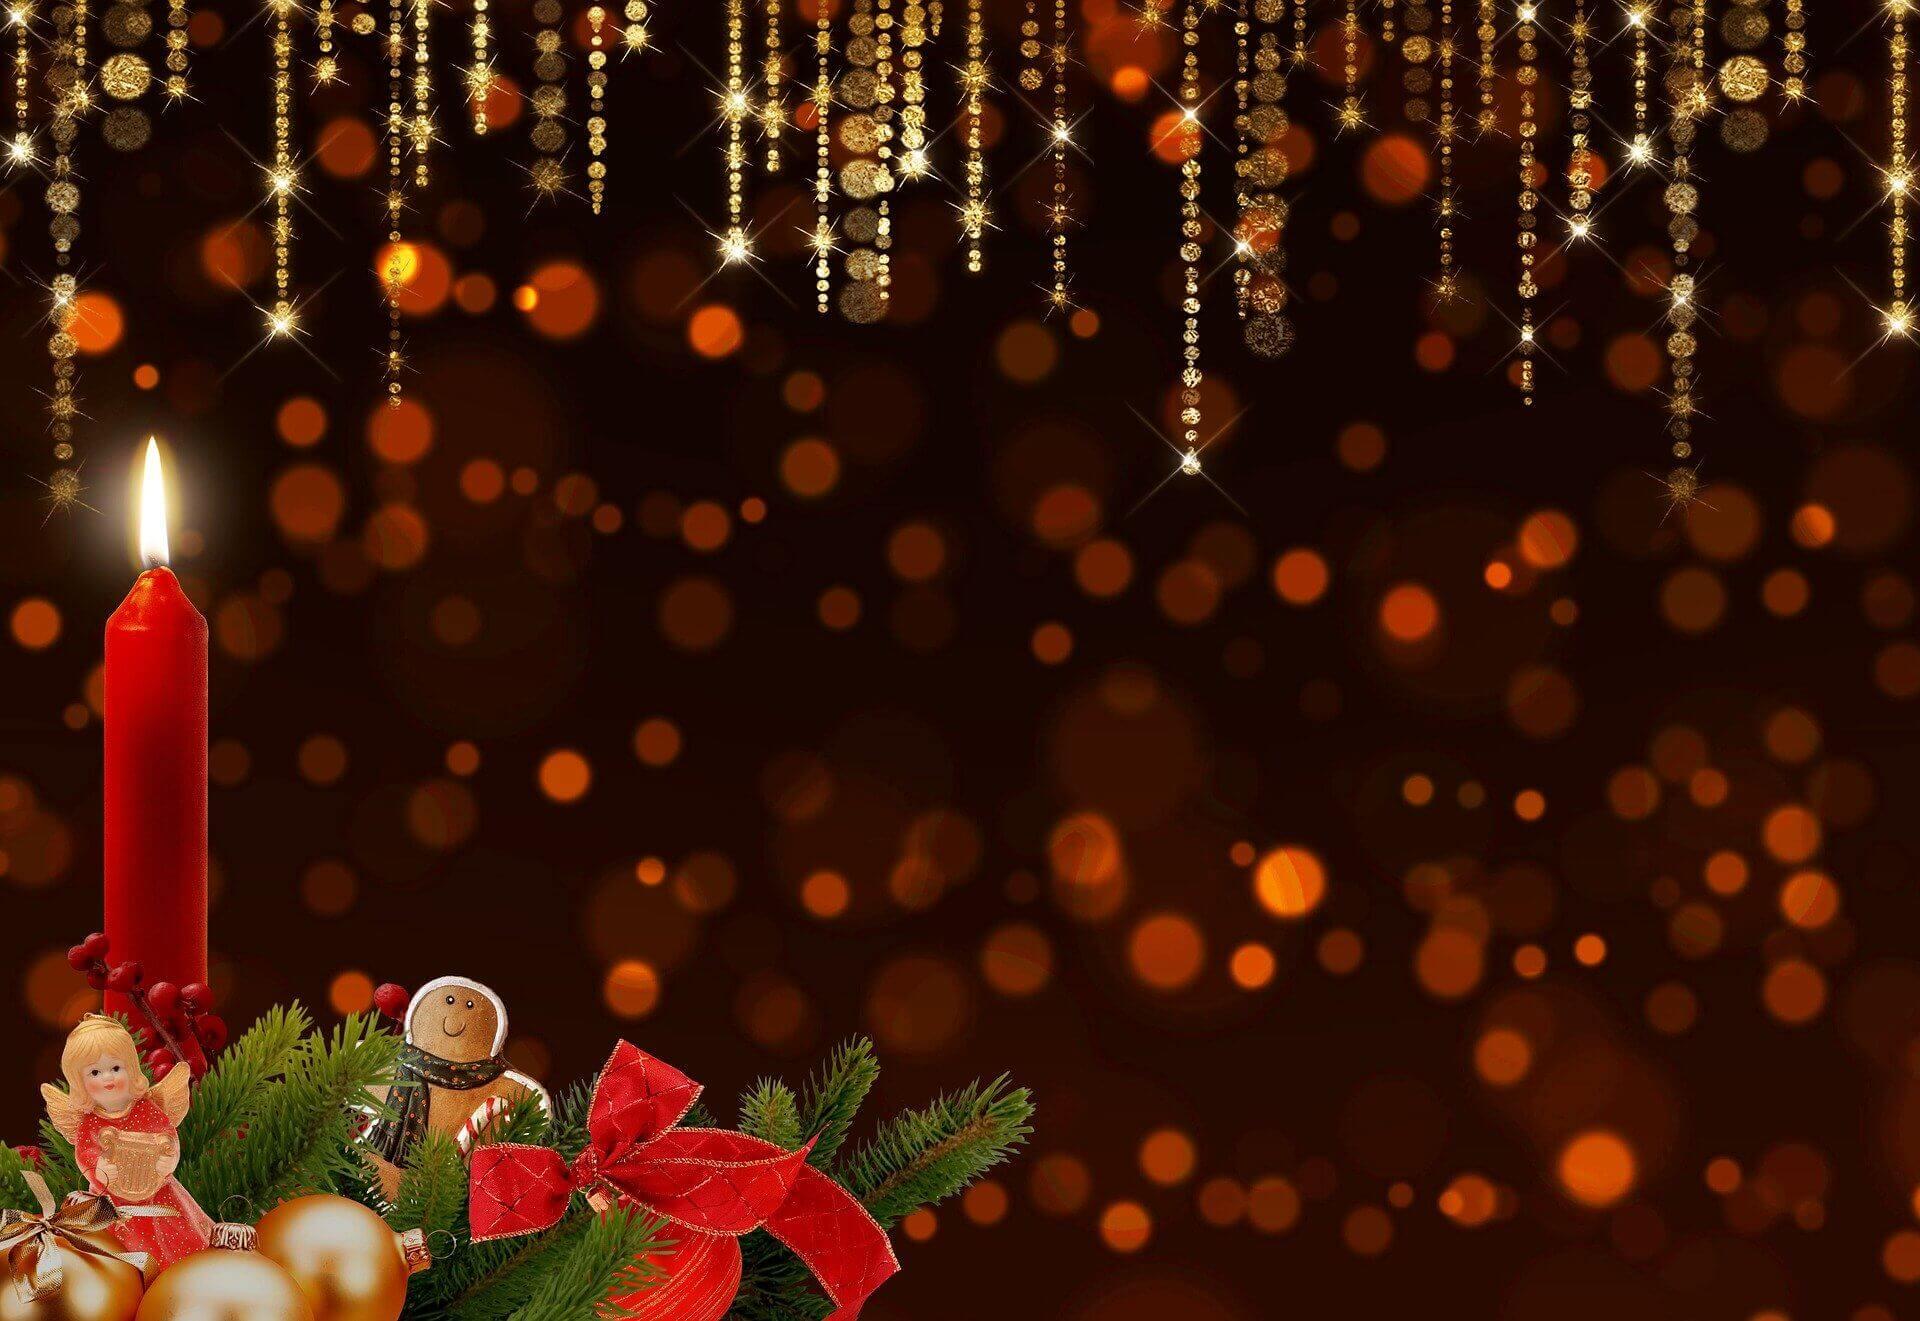 1. Advent Feiertag